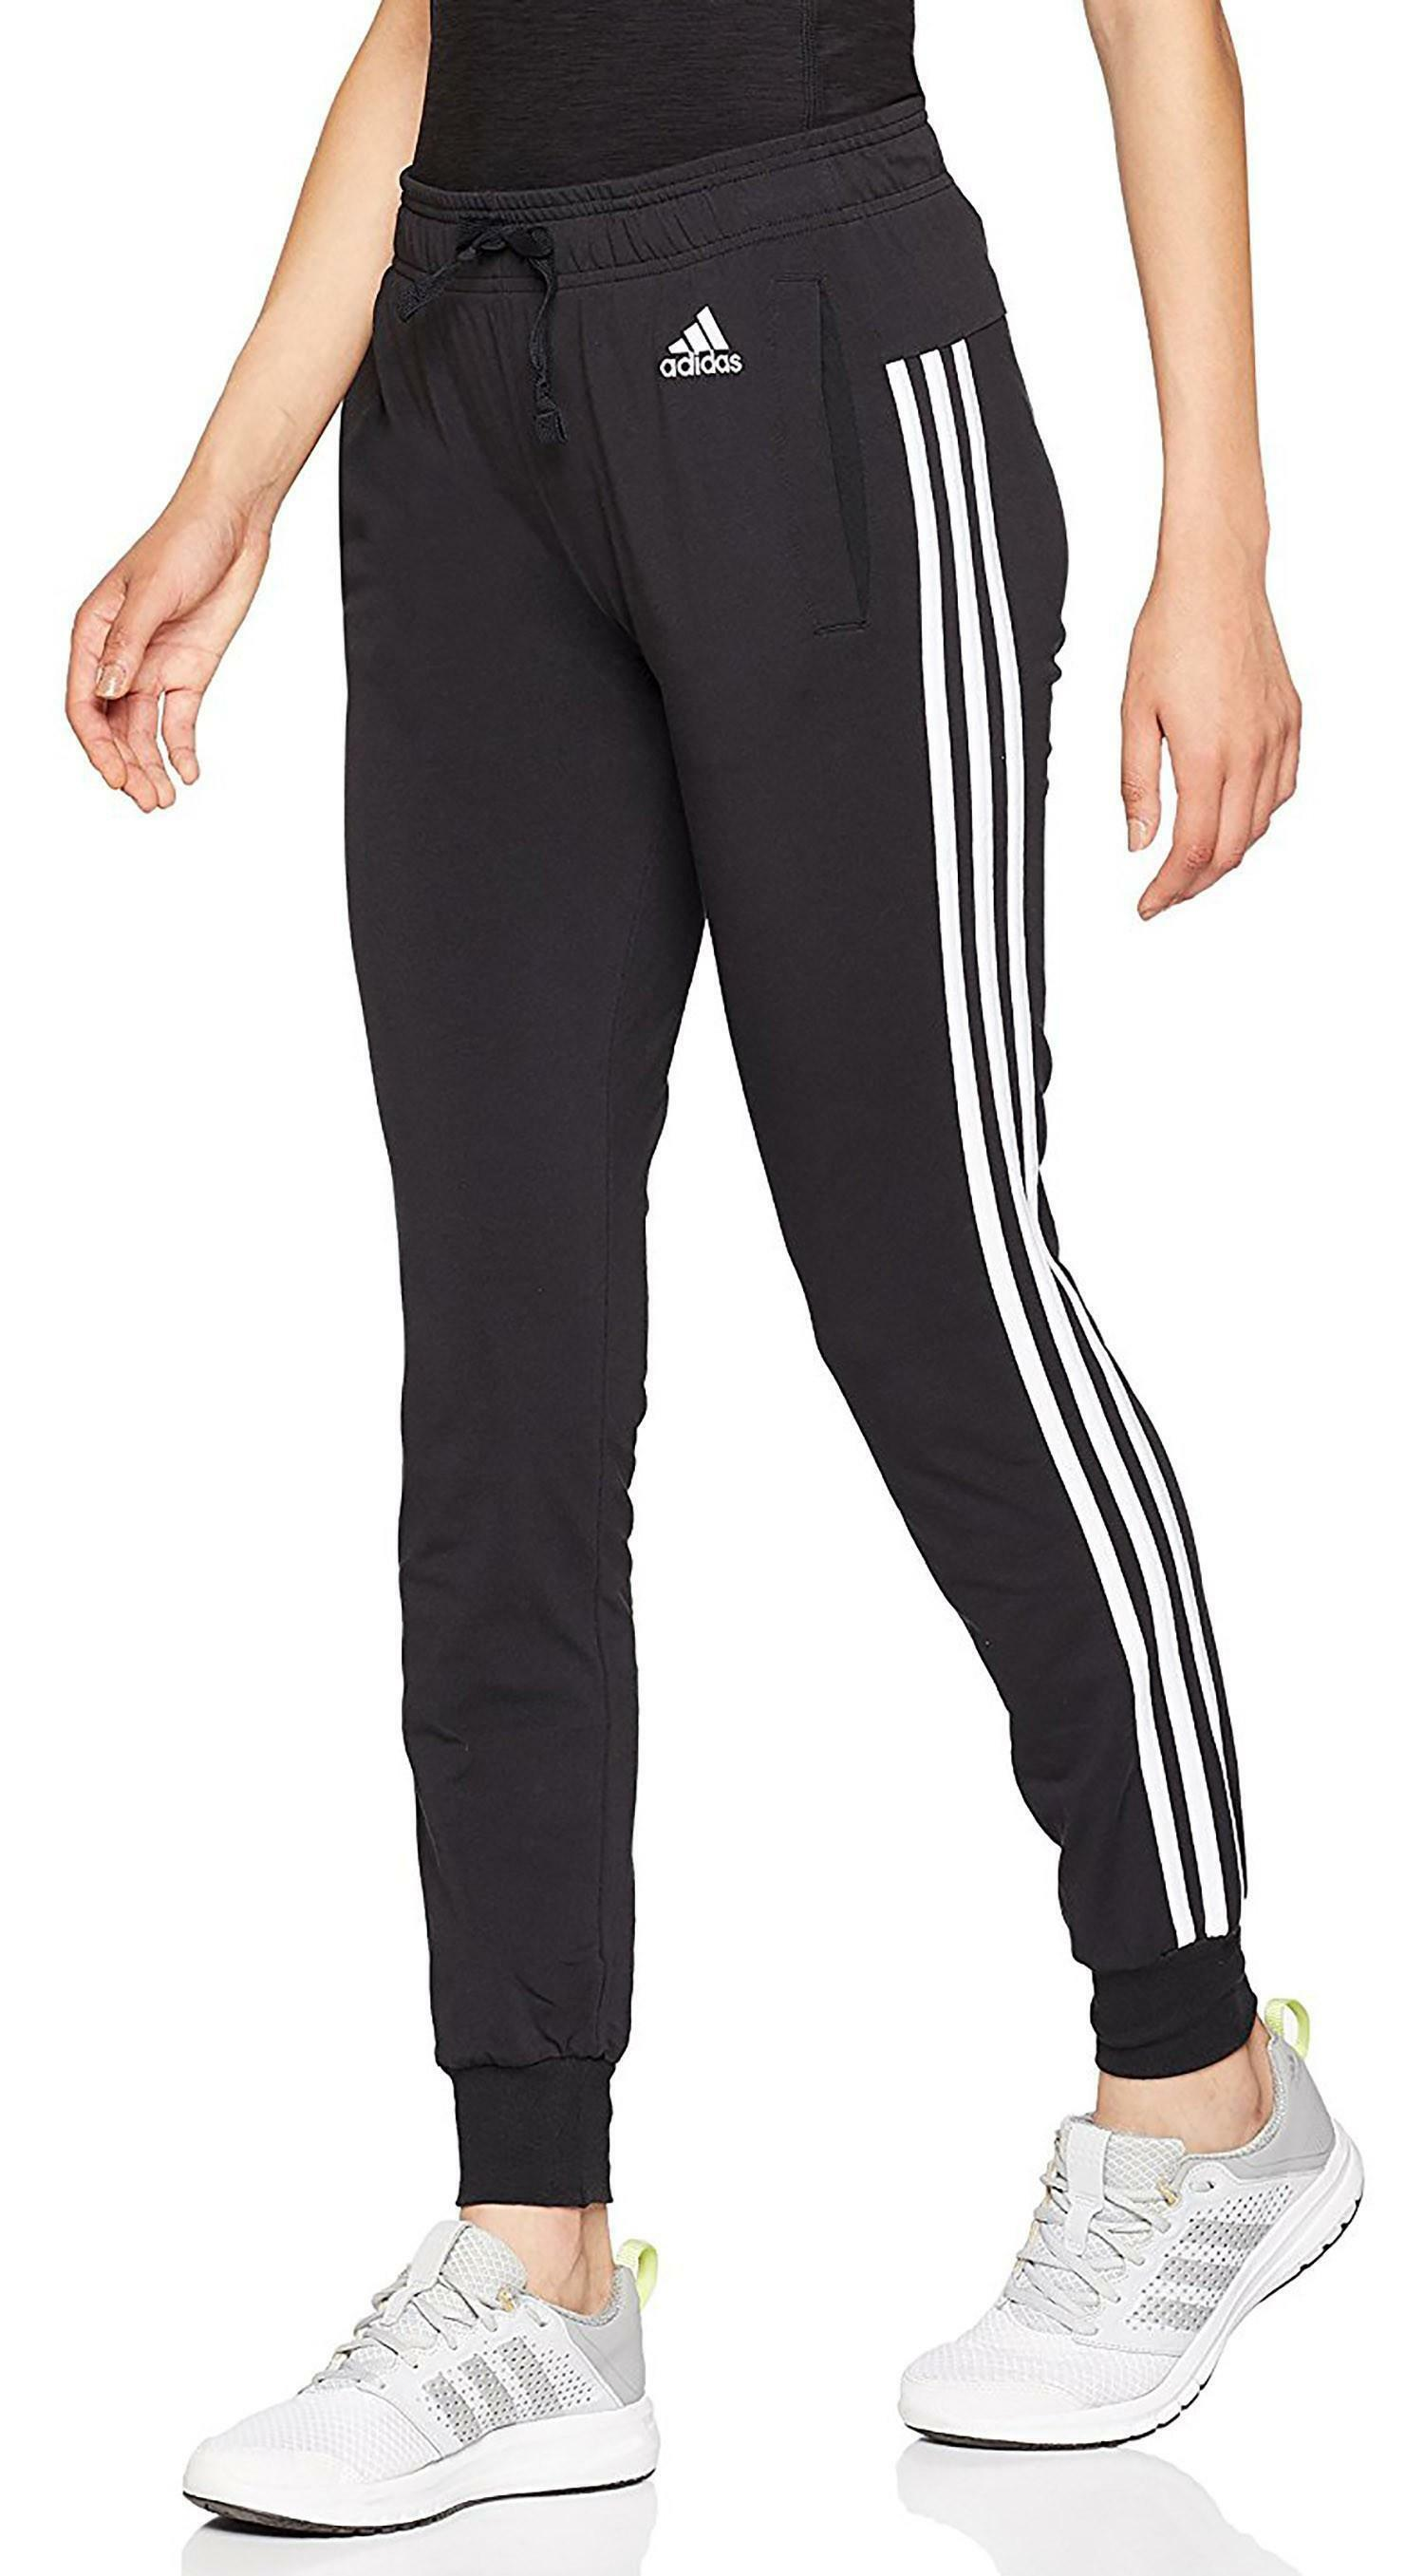 pantaloni adidas 3s